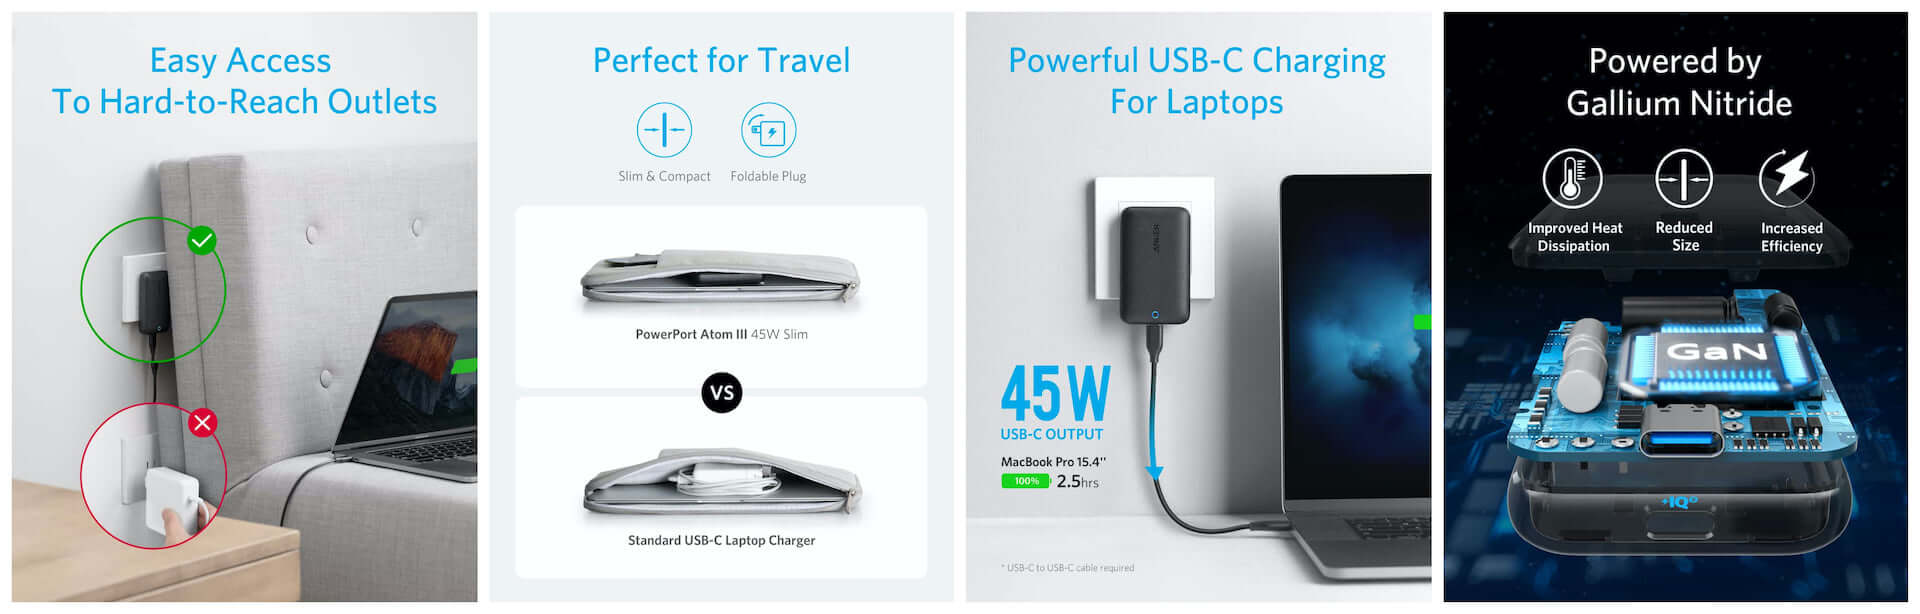 USB-CポートでスマホもPCも急速充電!Ankerからコンパクトながら最大45W出力の充電器が登場 tech200604_anker_powerport_02-1920x614